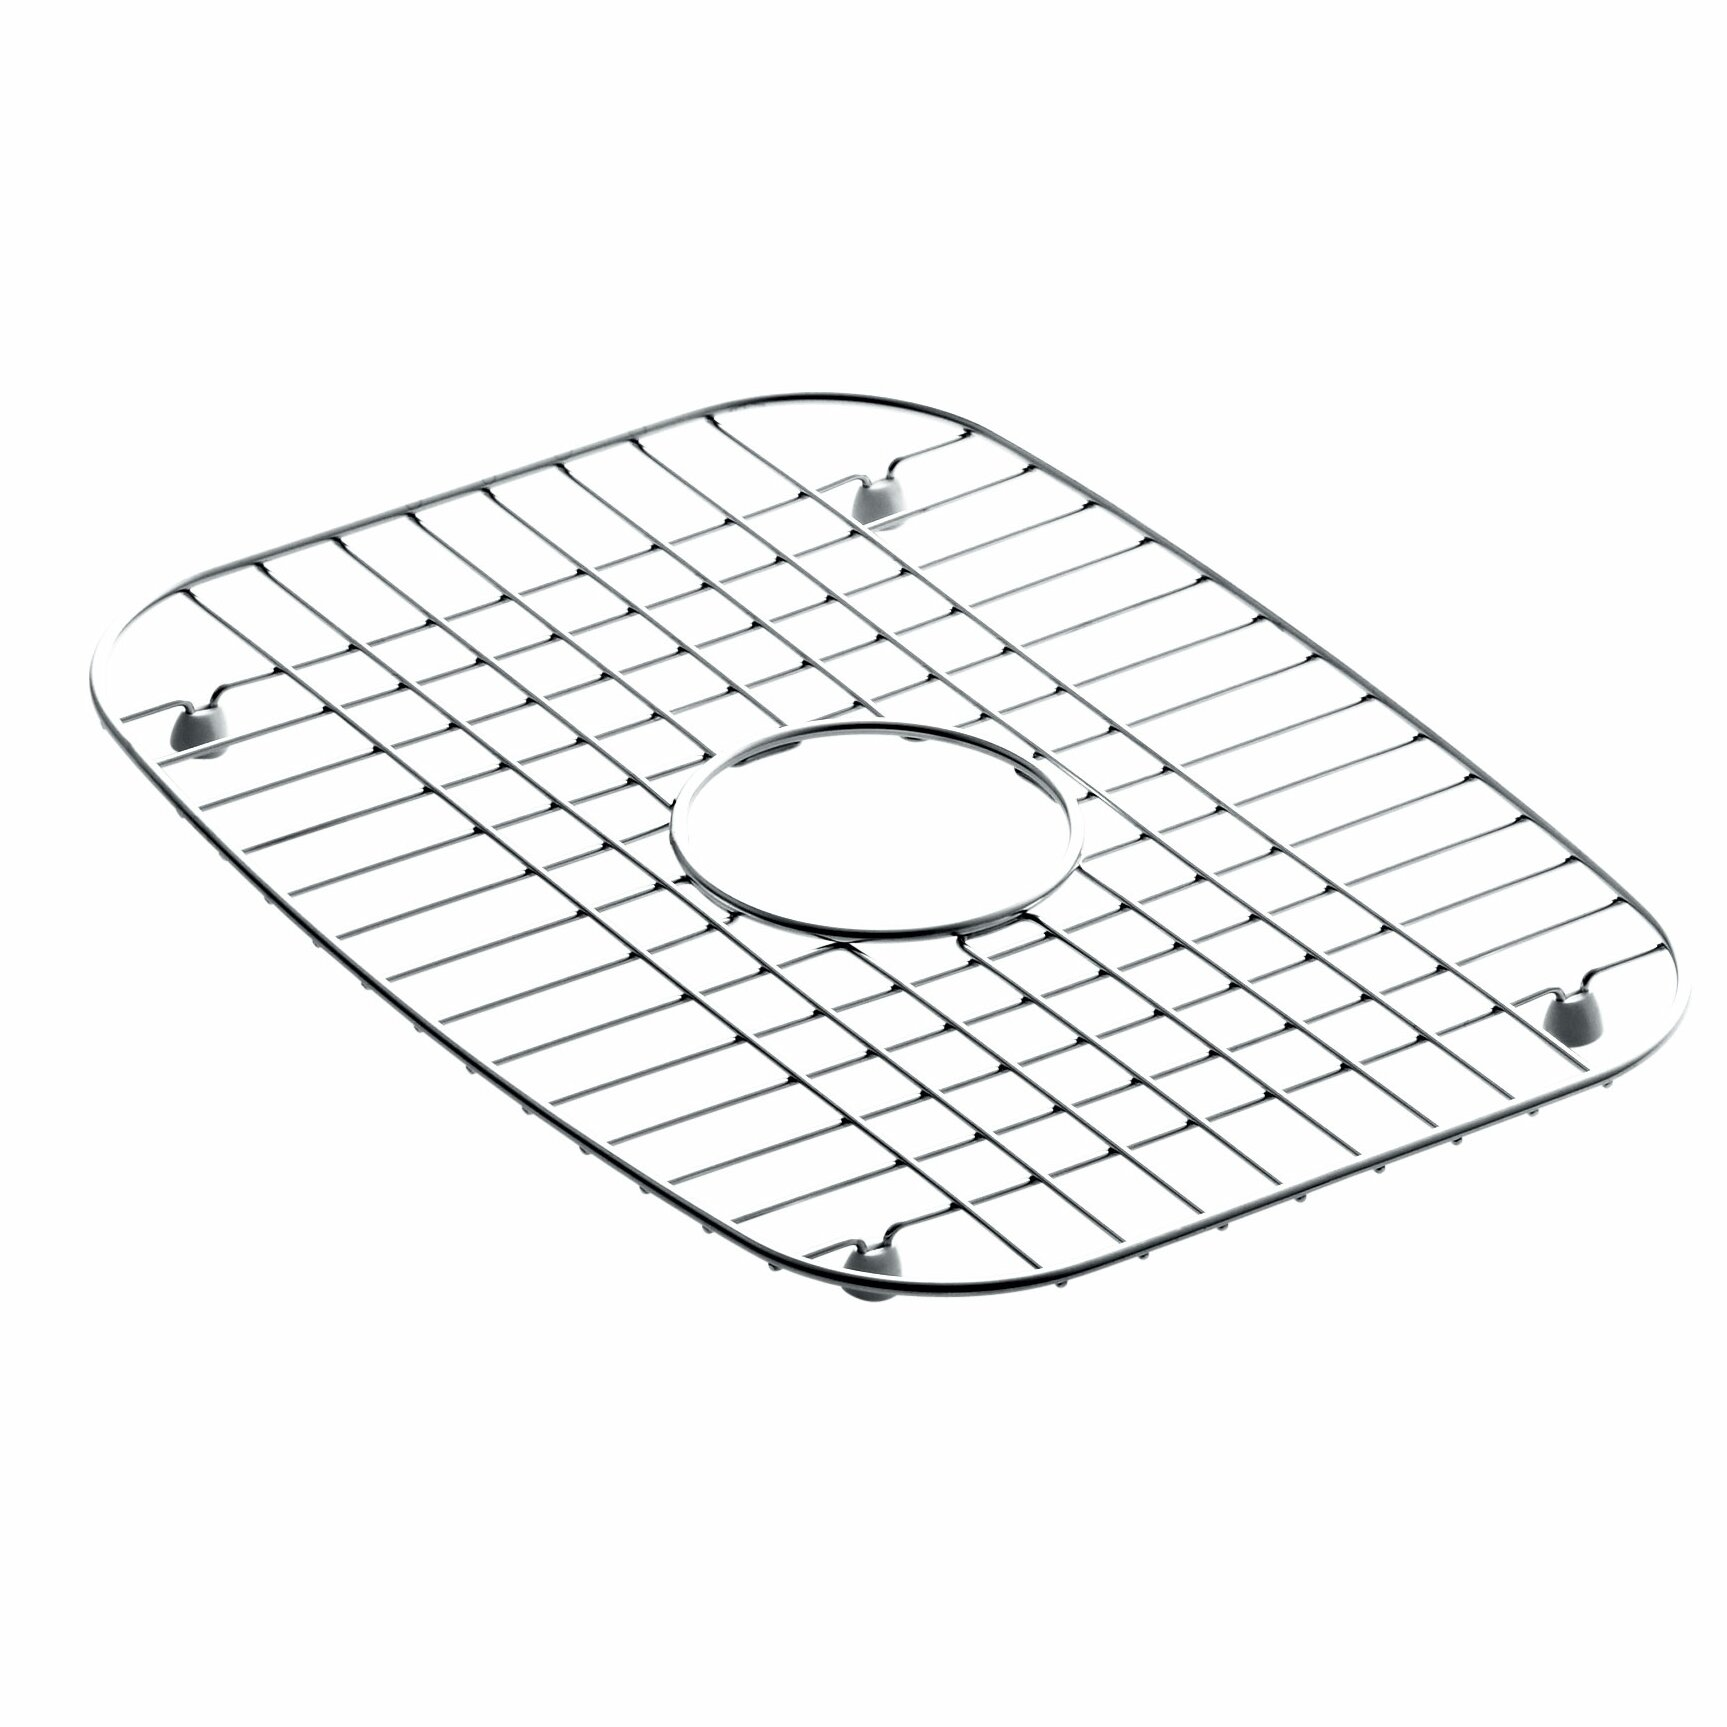 kohler stainless steel sink rack 12 1 4 x 16 1 2 for undertone and verse kitchen sinks. Black Bedroom Furniture Sets. Home Design Ideas